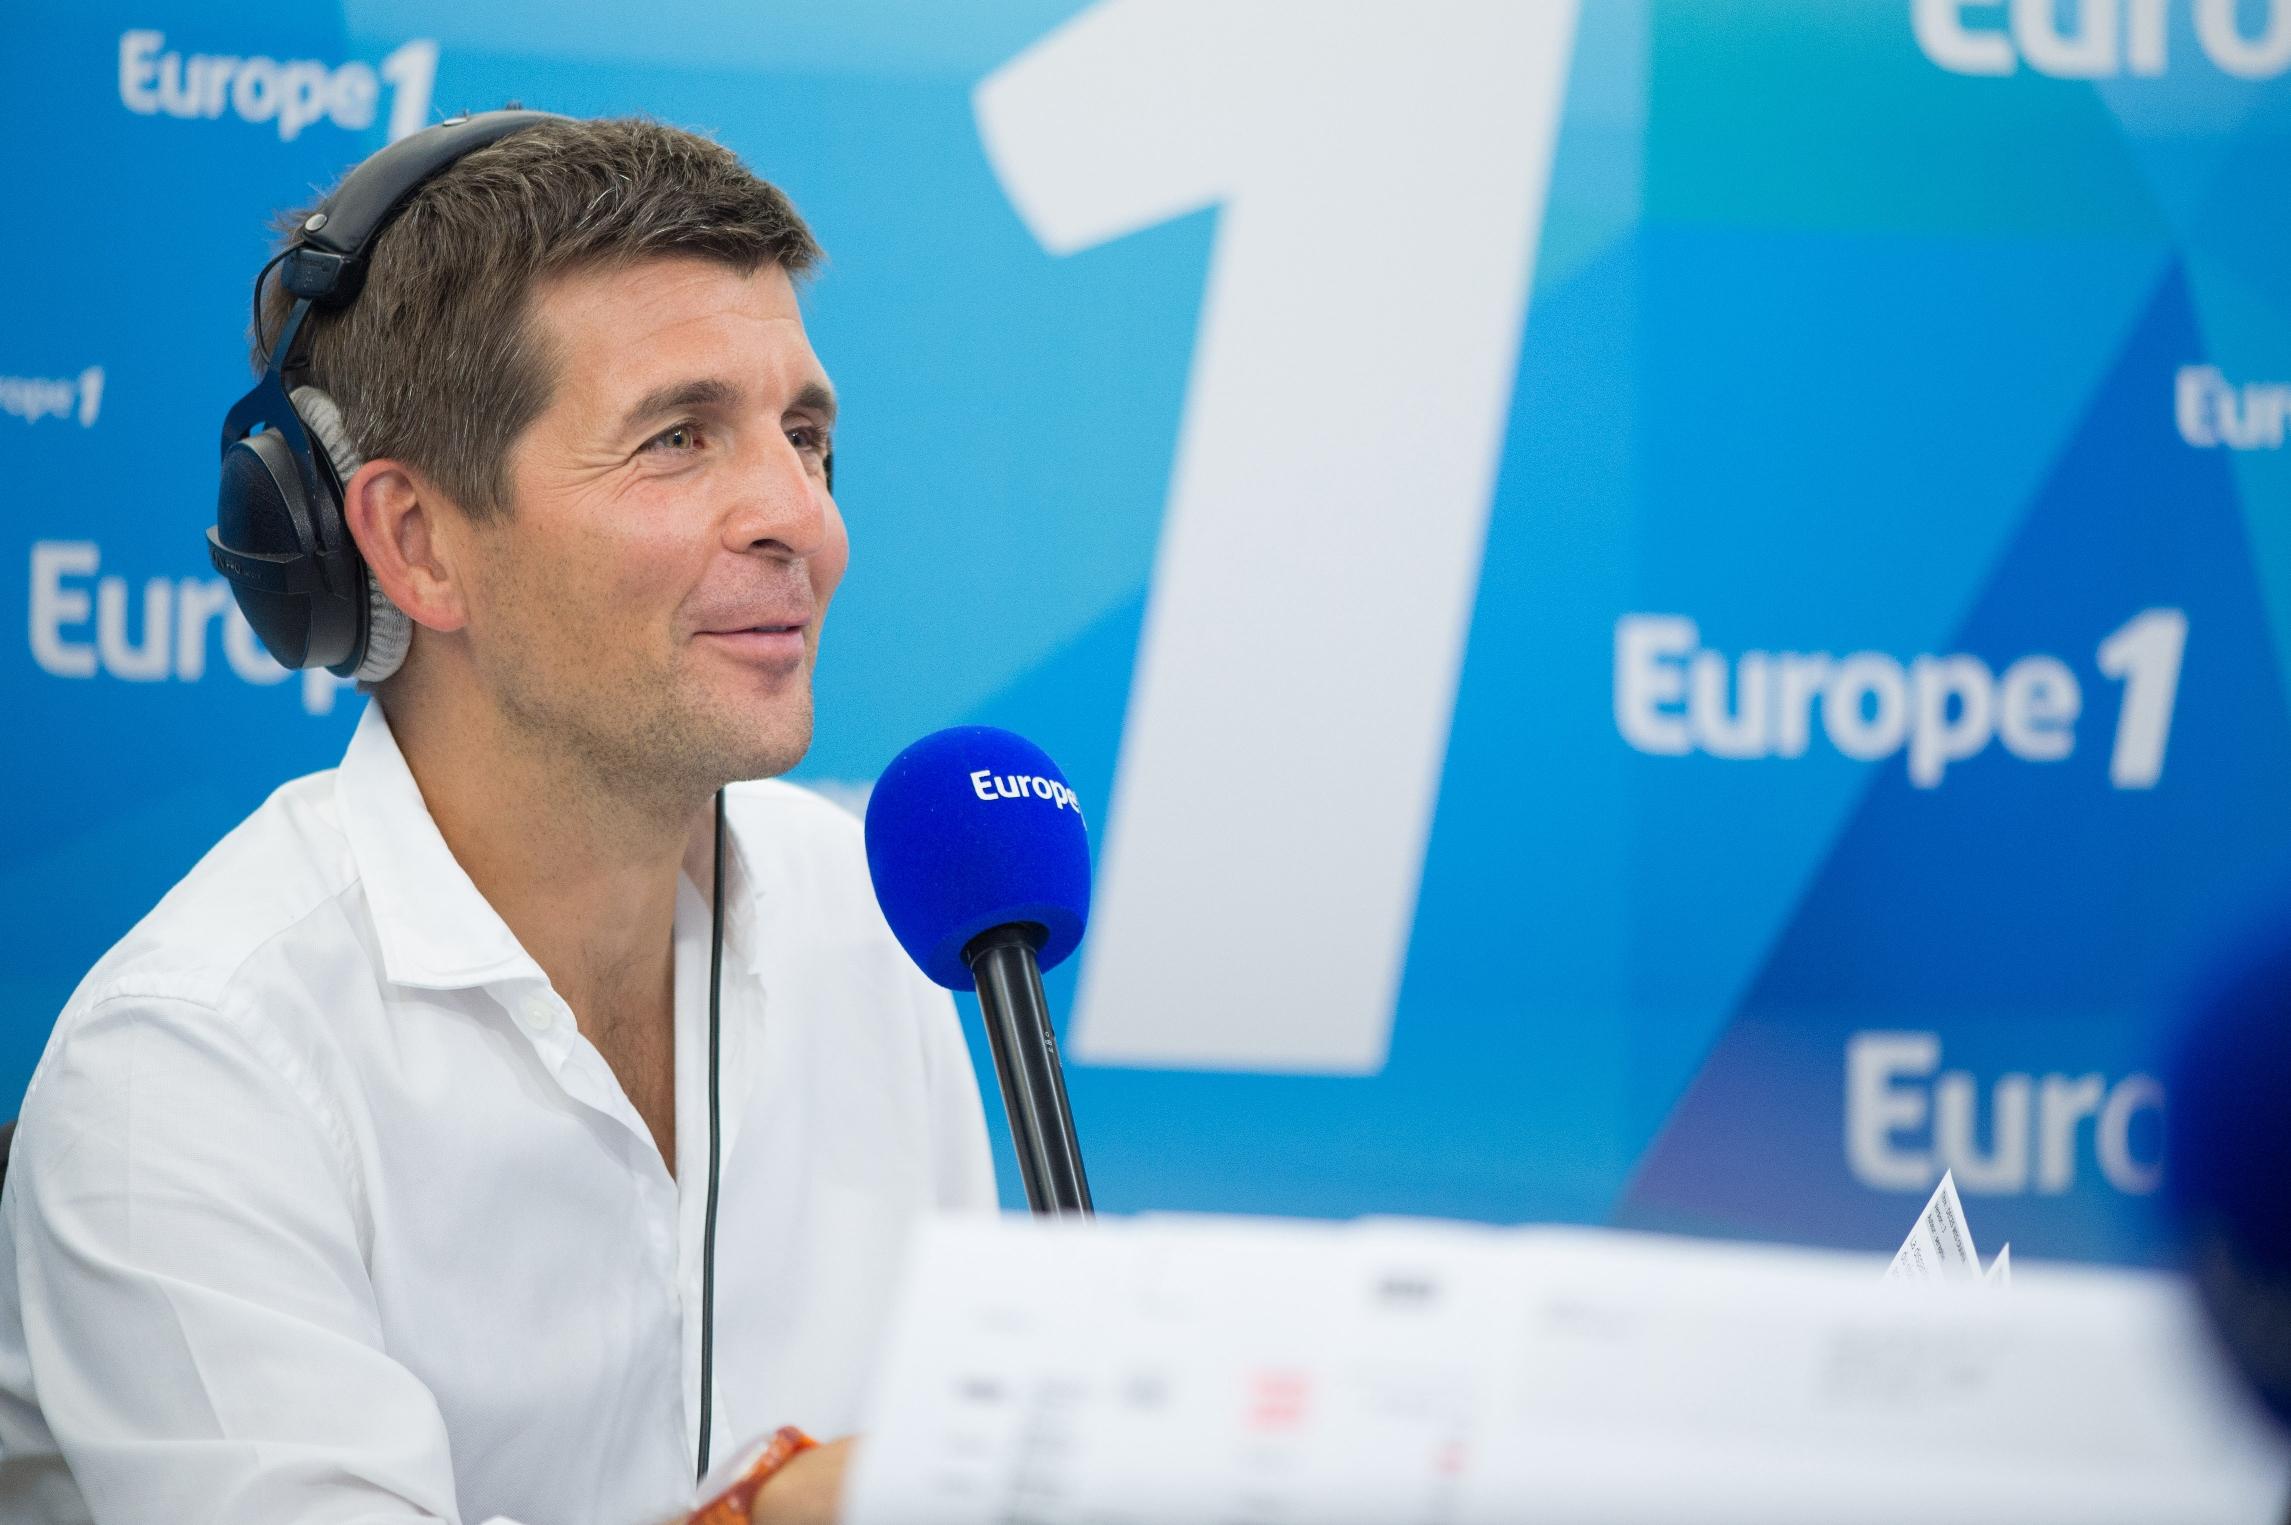 Thomas Sotto anchorman de la matinale Europe 1 © Christophe Guibbaud Capa Pictures